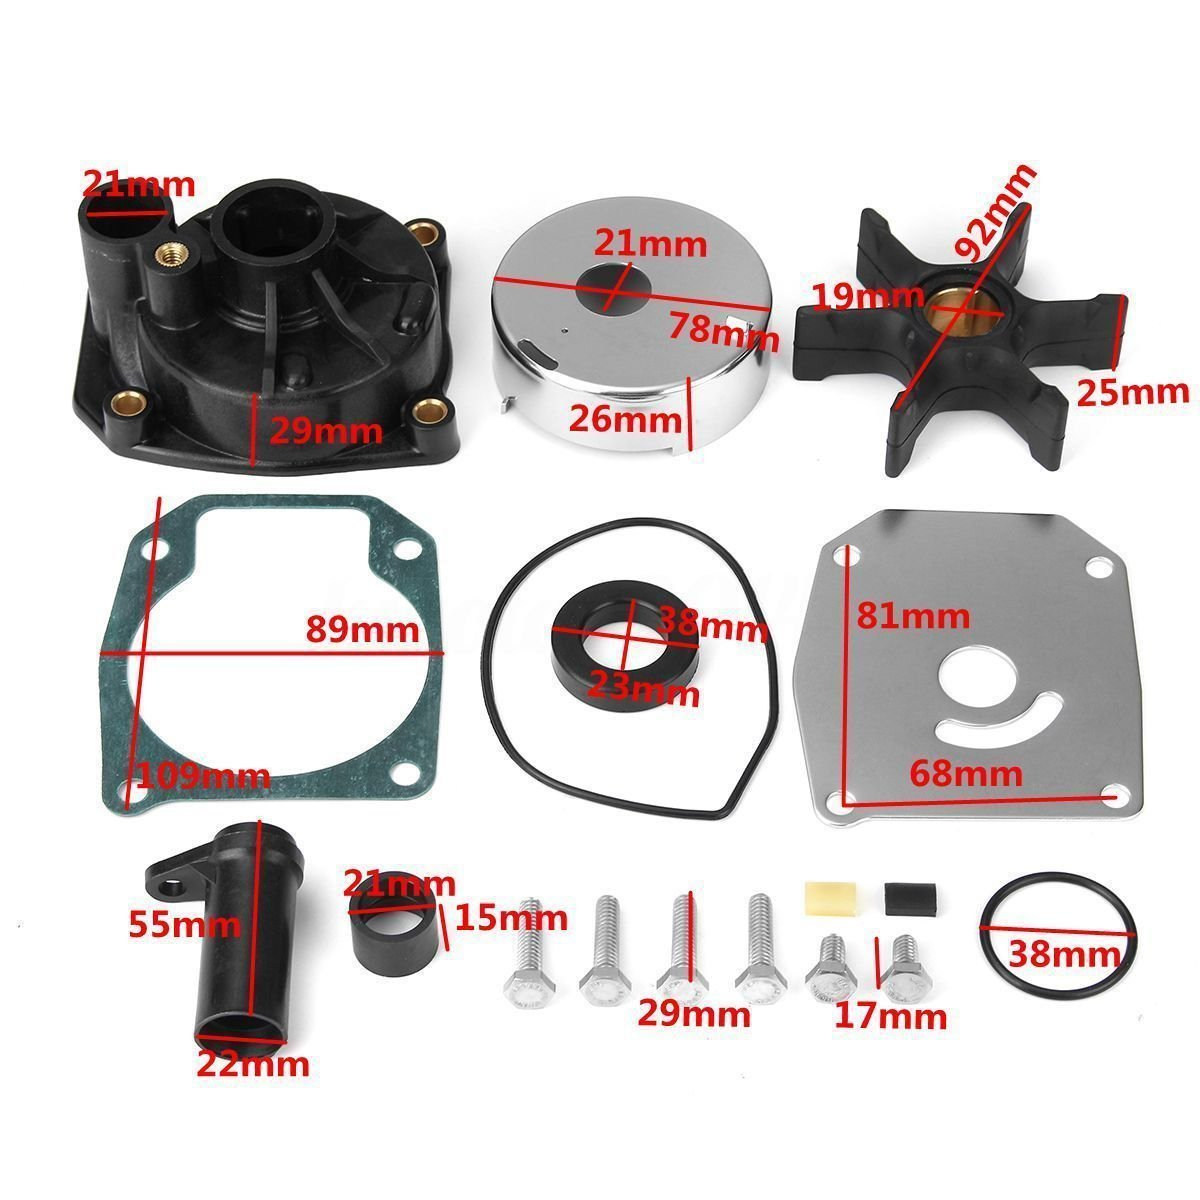 Water Pump Impeller Kit 438597 432955 for Johnson Evinrude 60 65 70 75HP 18-3389